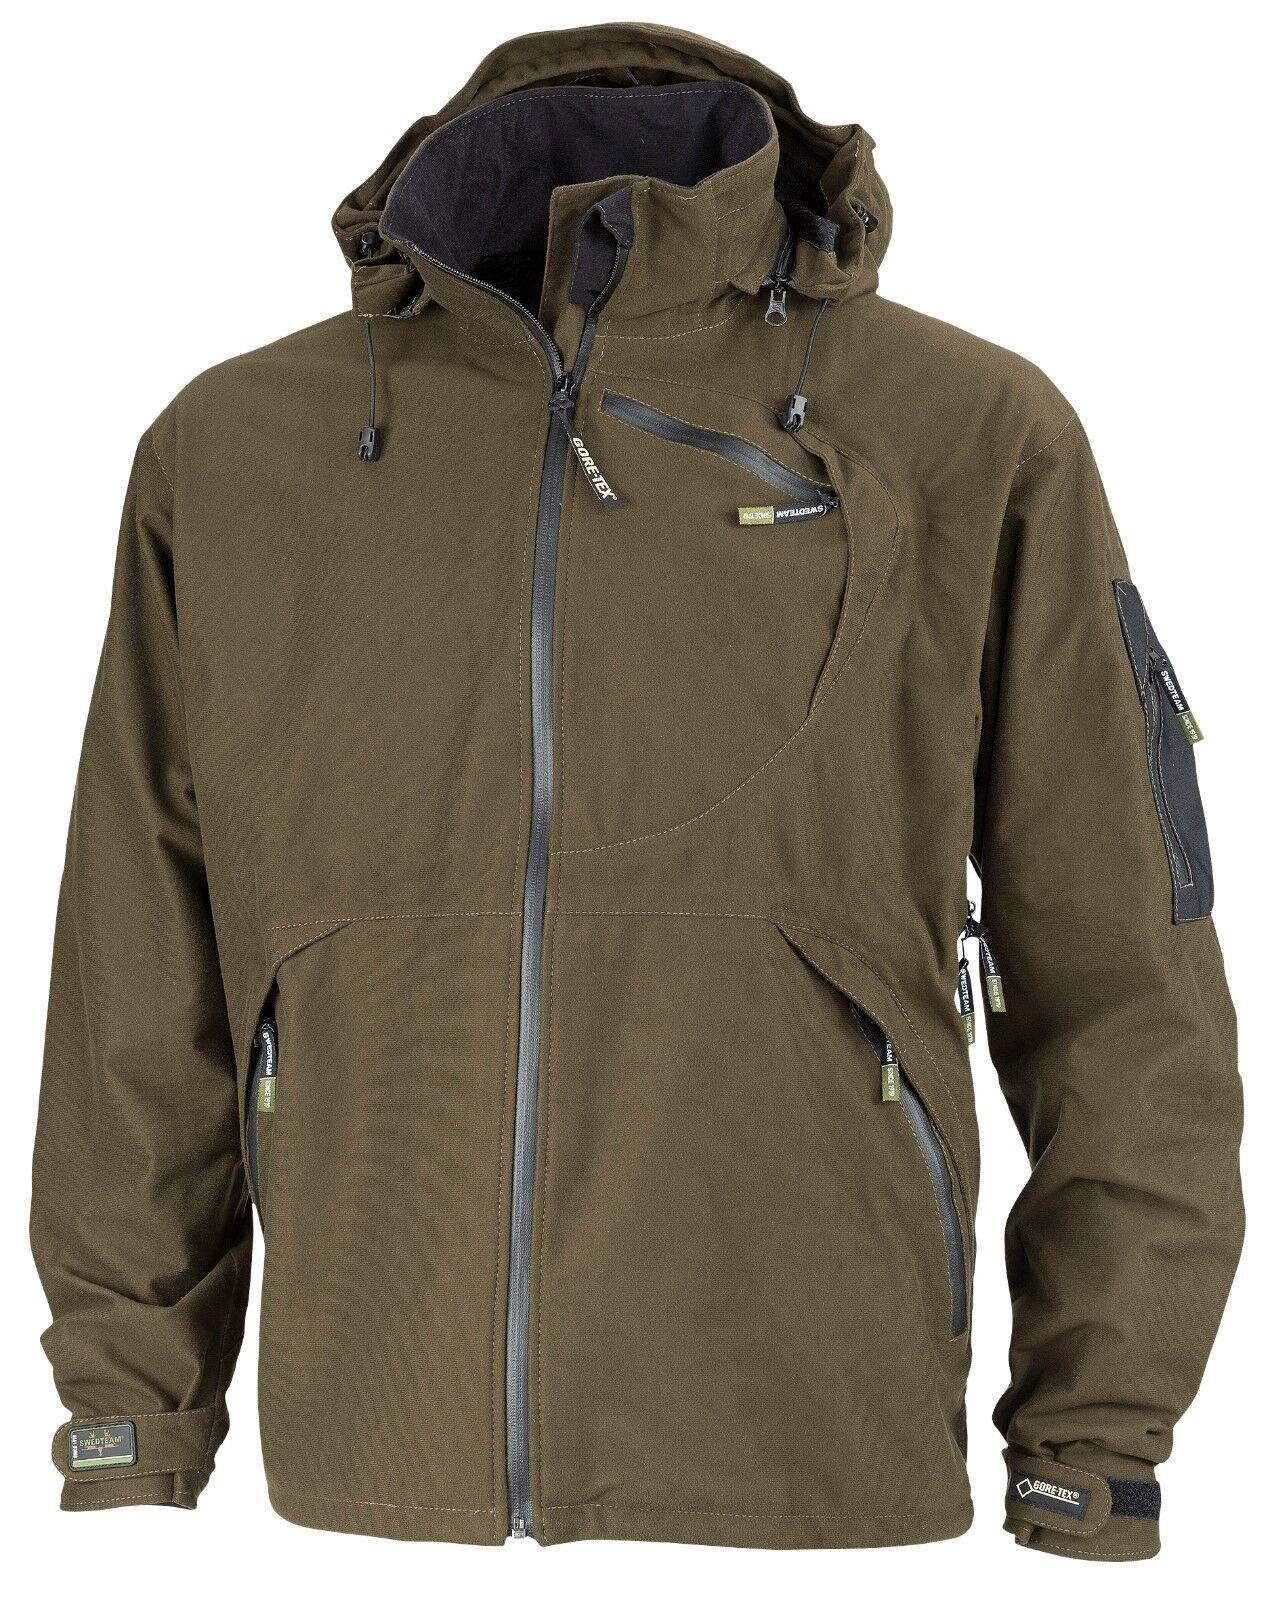 Swedteam caza chaqueta melvin Goretex-verde-Art 51-149 talla 54